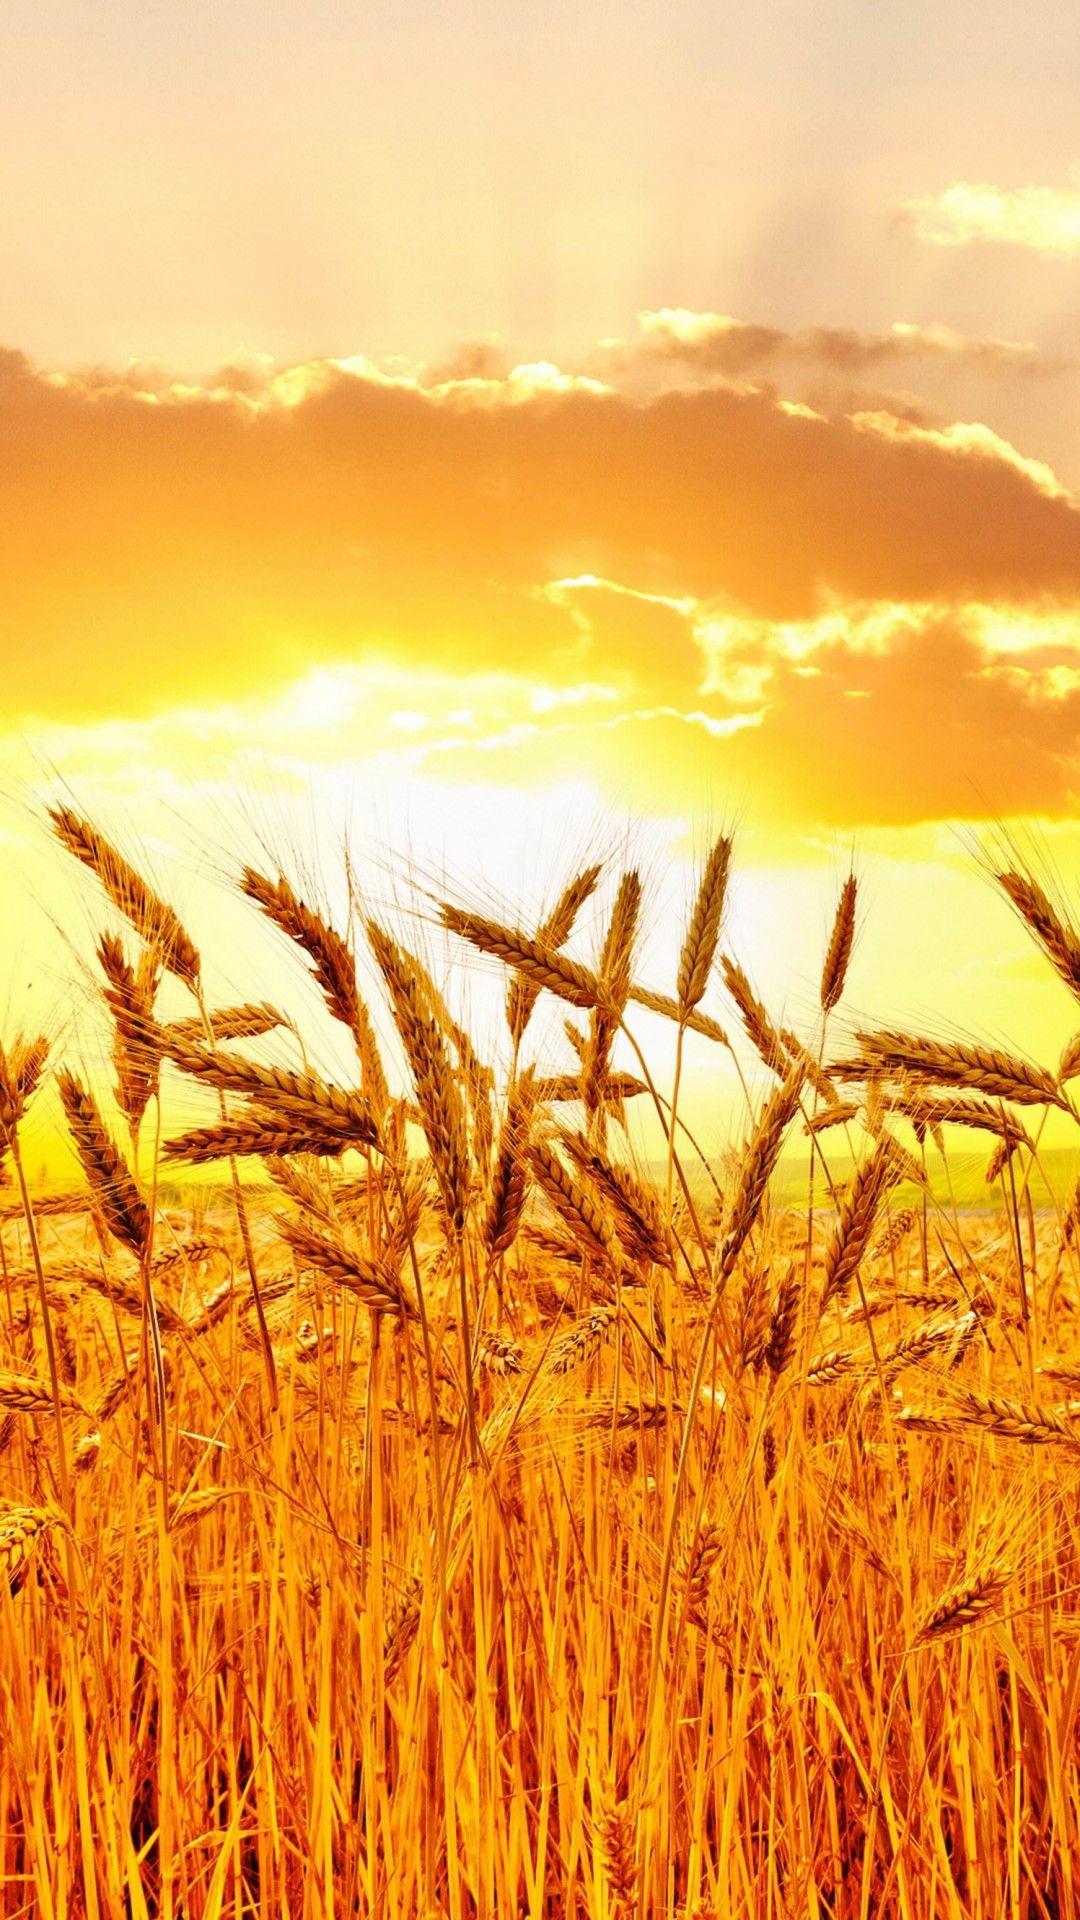 Golden Wheat Field At Sunset Hd Wallpaper For Galaxy S5 Field Wallpaper Nature Photography Nature Iphone Wallpaper